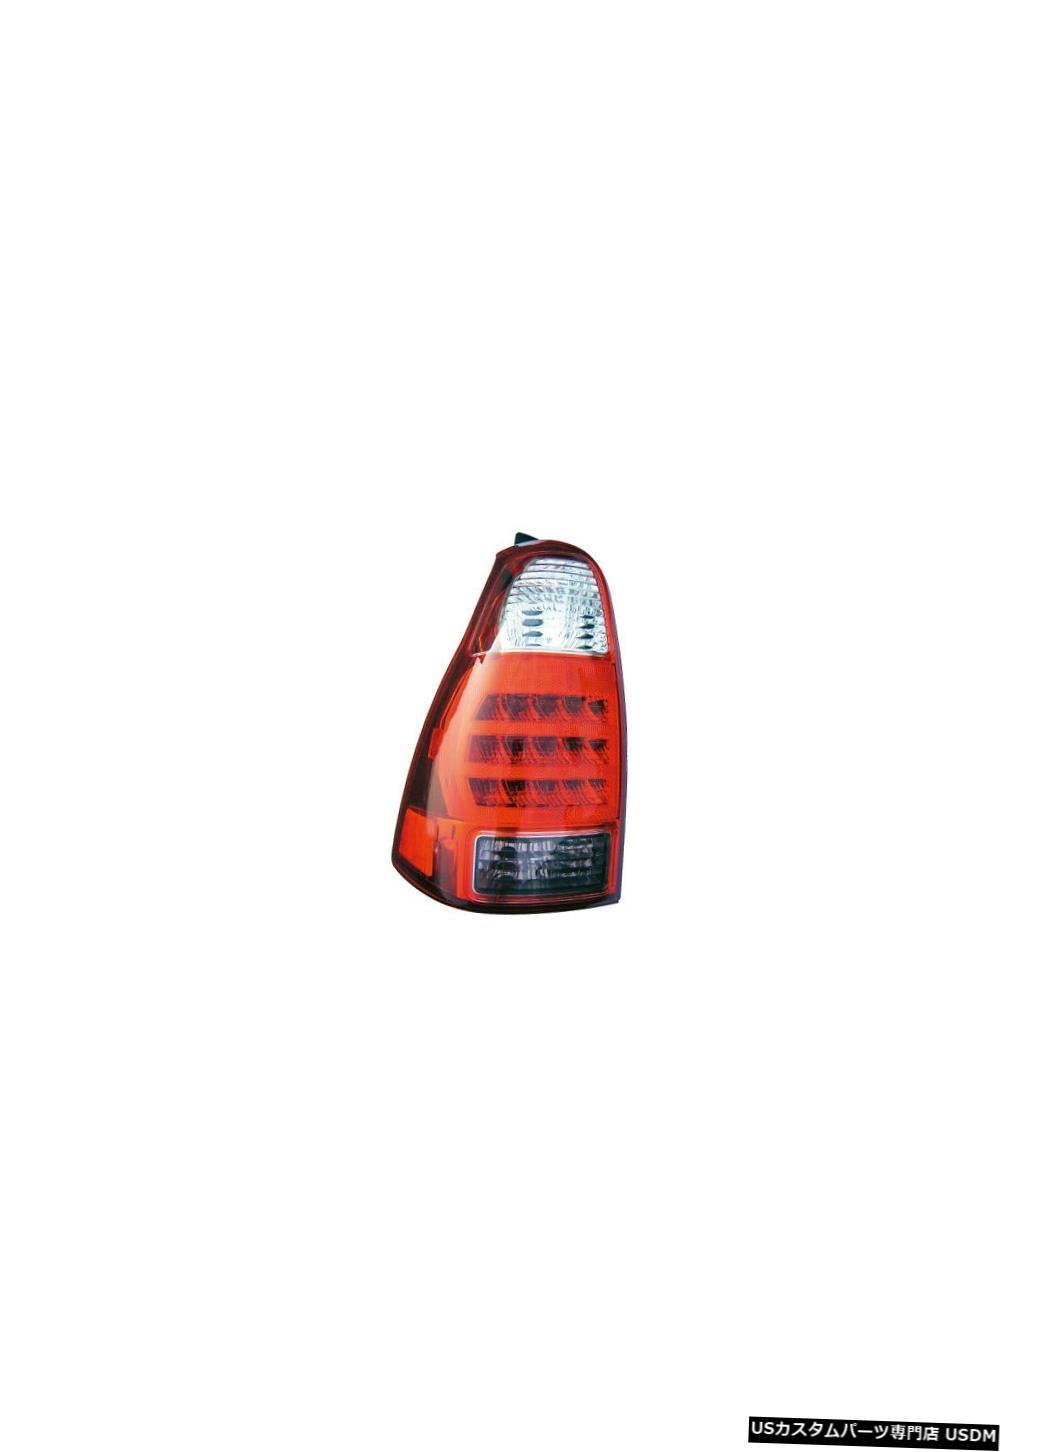 Tail light 06-09トヨタ4ランナードライバー左用テールライトリアバックランプ Tail Light Rear Back Lamp for 06-09 Toyota 4Runner Driver Left